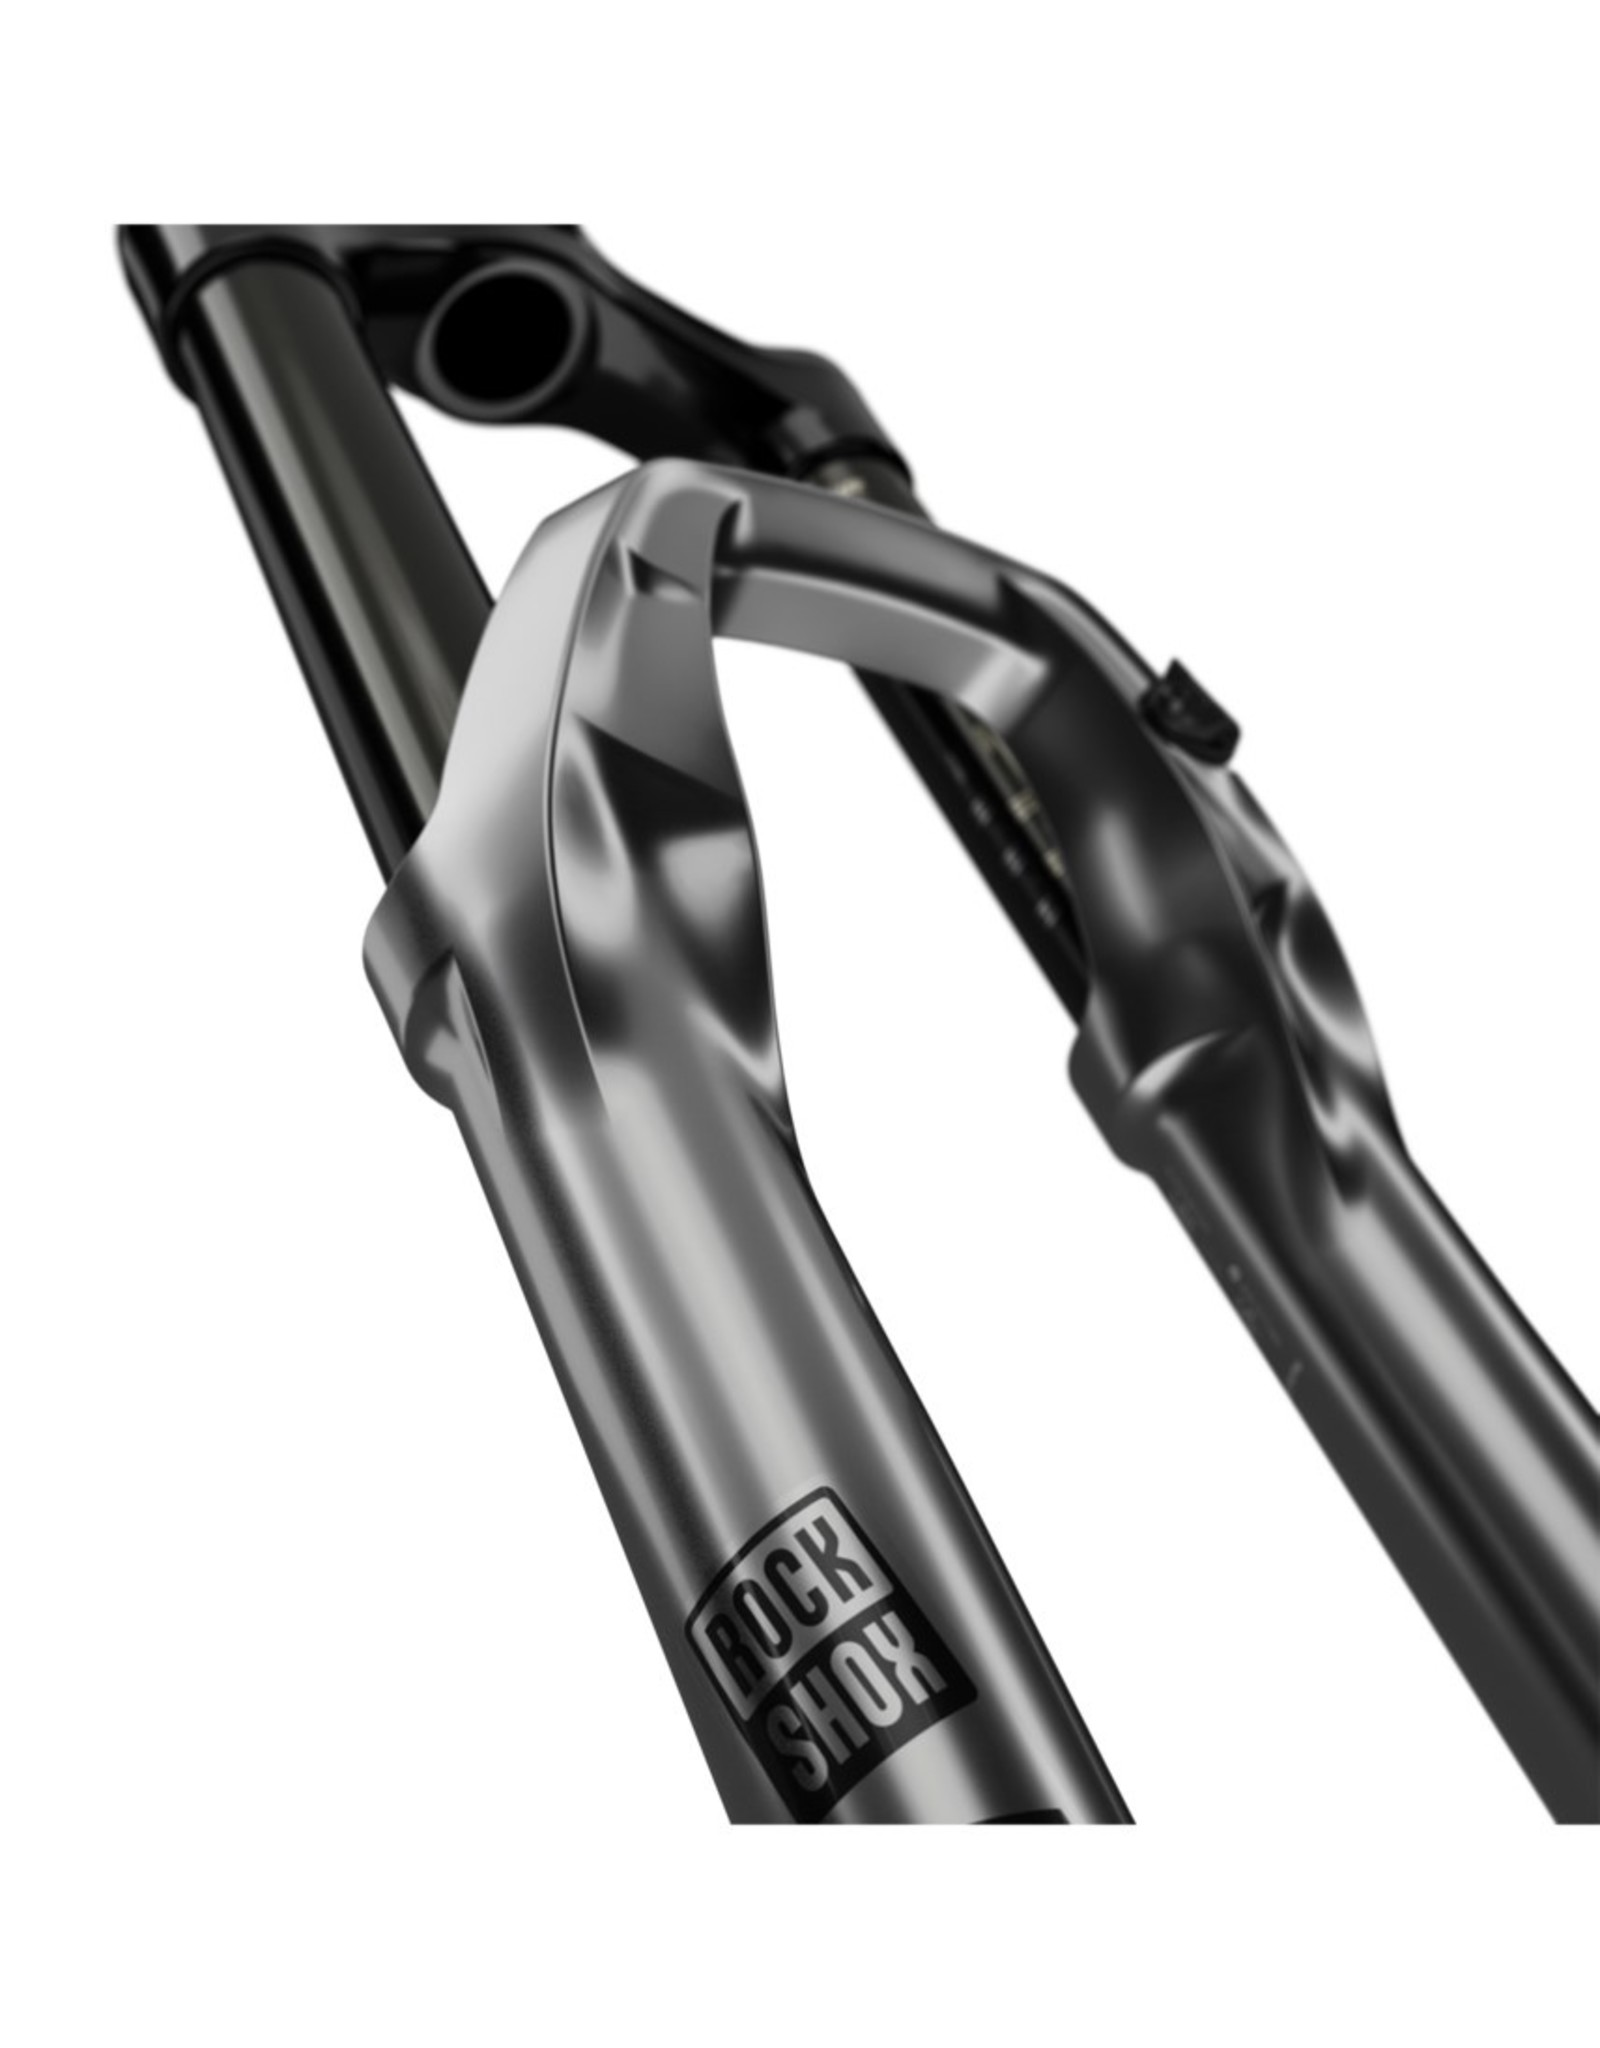 ROCKSHOX RS Pike Ultimate RC2 B4, Suspension Fork, 29'', DebonAir, 150mm, 1-1/8''-1.5'', 15x110mm TA, Rake: 42mm, Silver